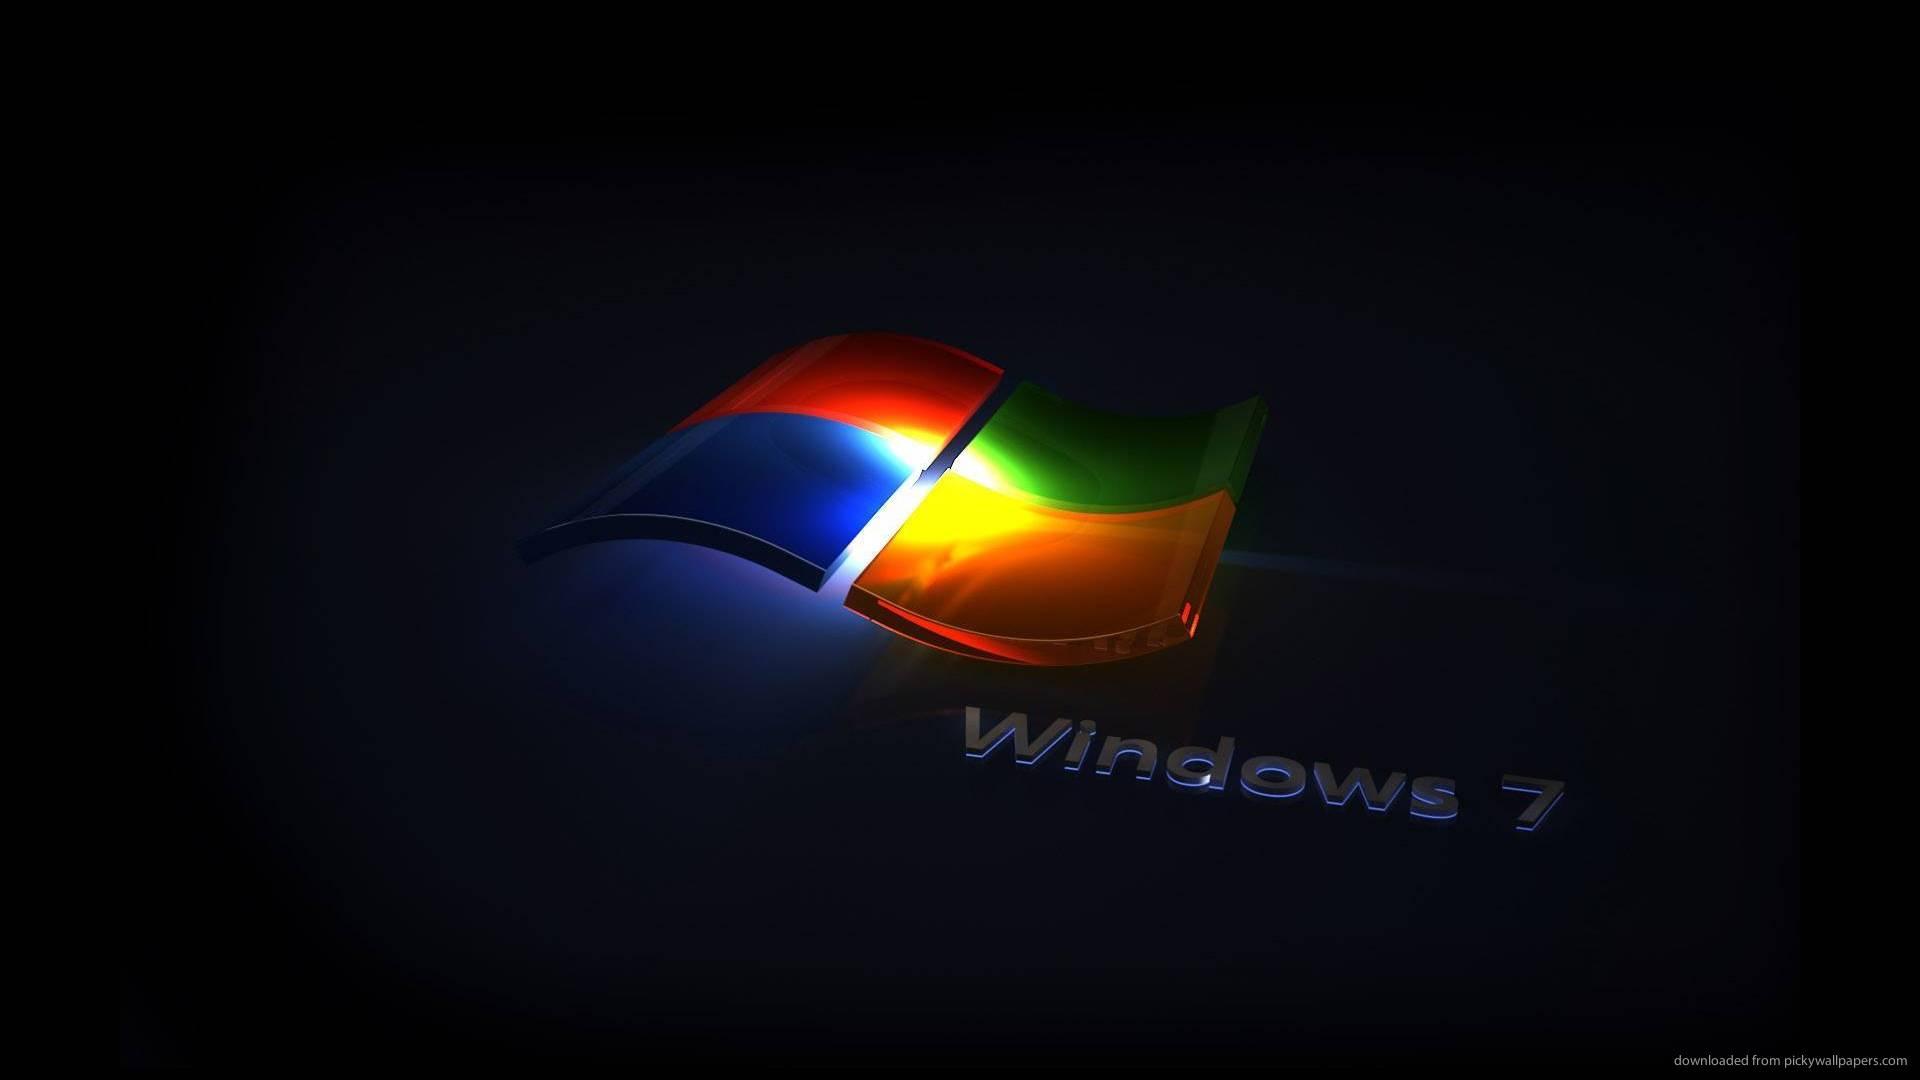 windows 7 wallpaper hd 1920x1080 wallpapersafari